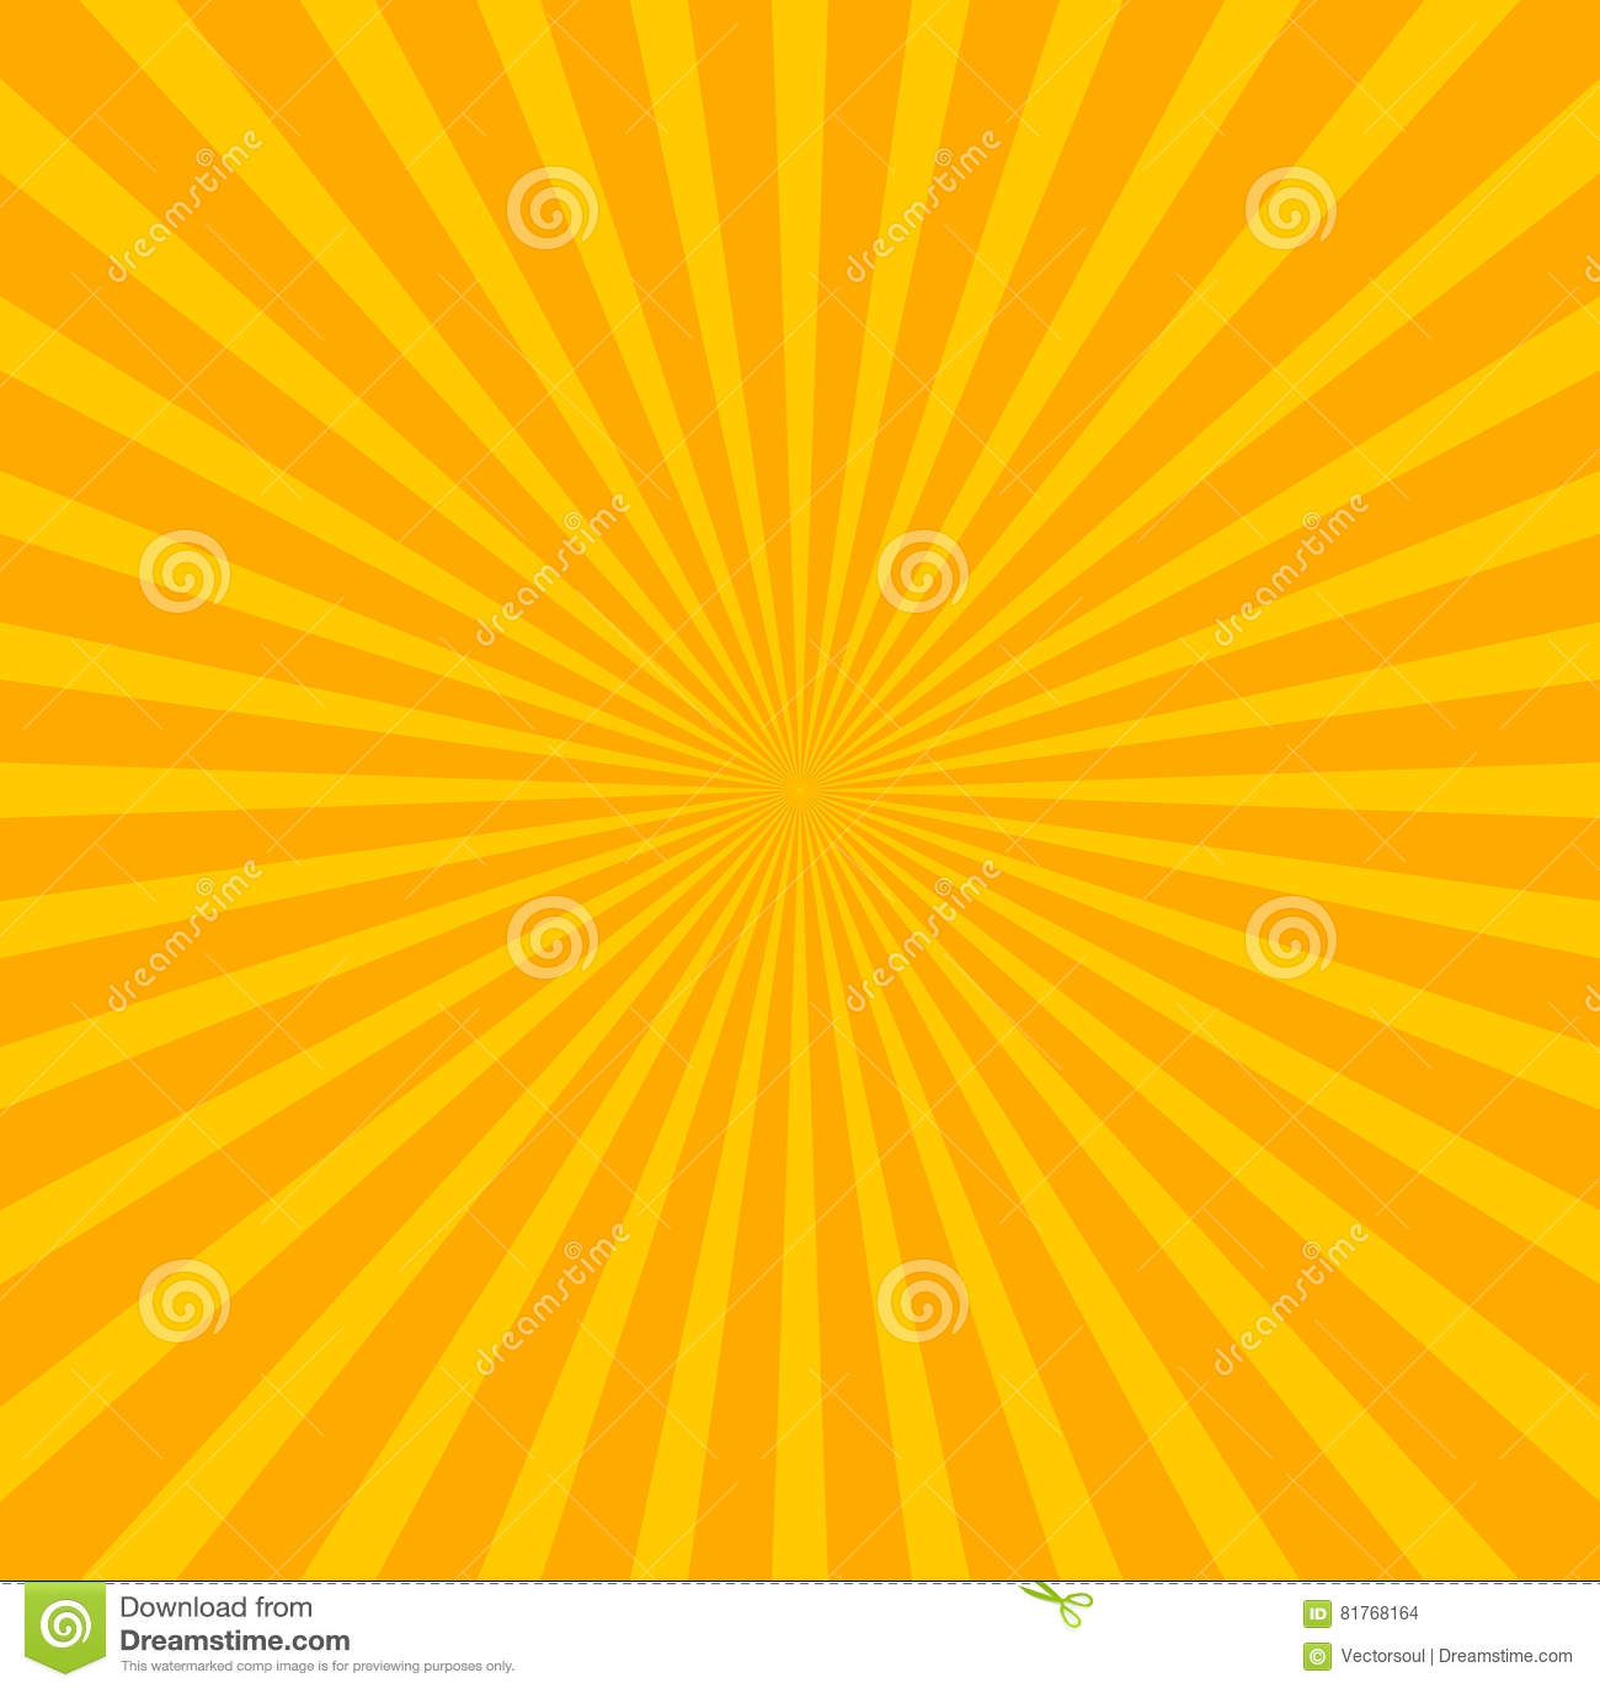 Download Bright Starburst Sunburst Background With Regular Radiating Li Stock Vector - Illustration of illustration, centre: 81768164